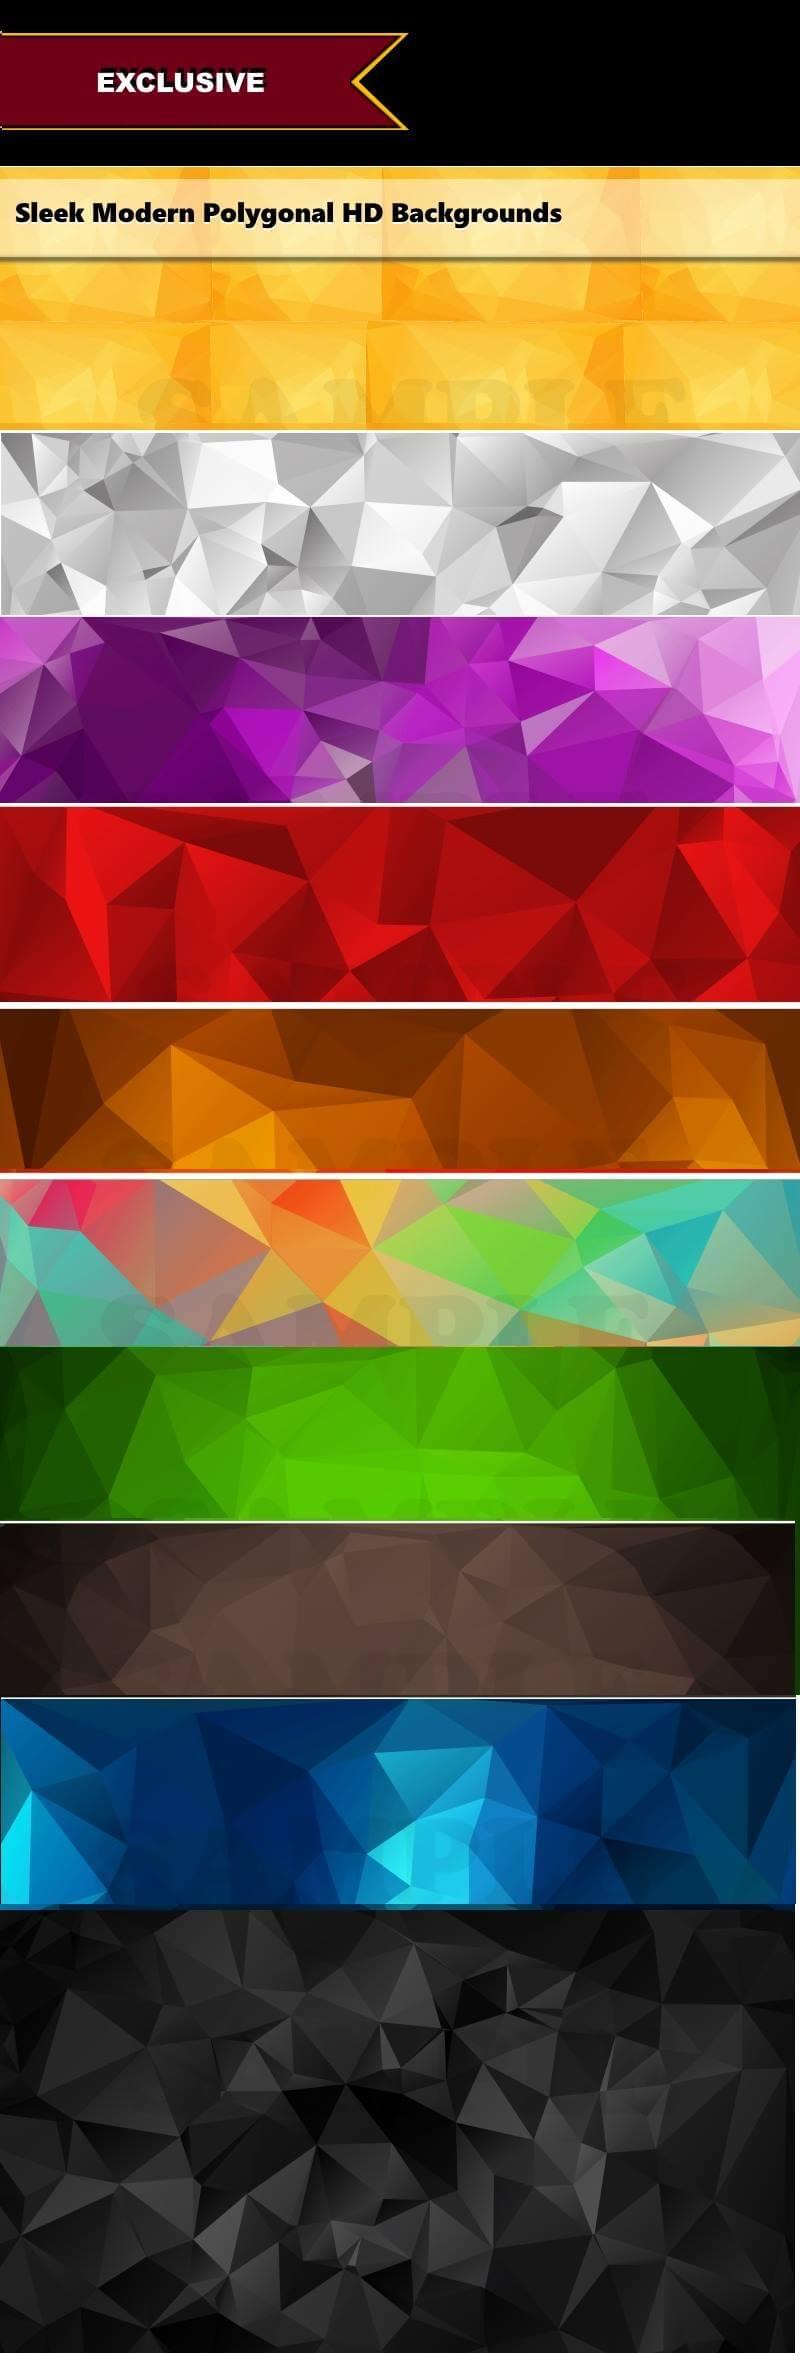 mm-bonus-backgrounds-1